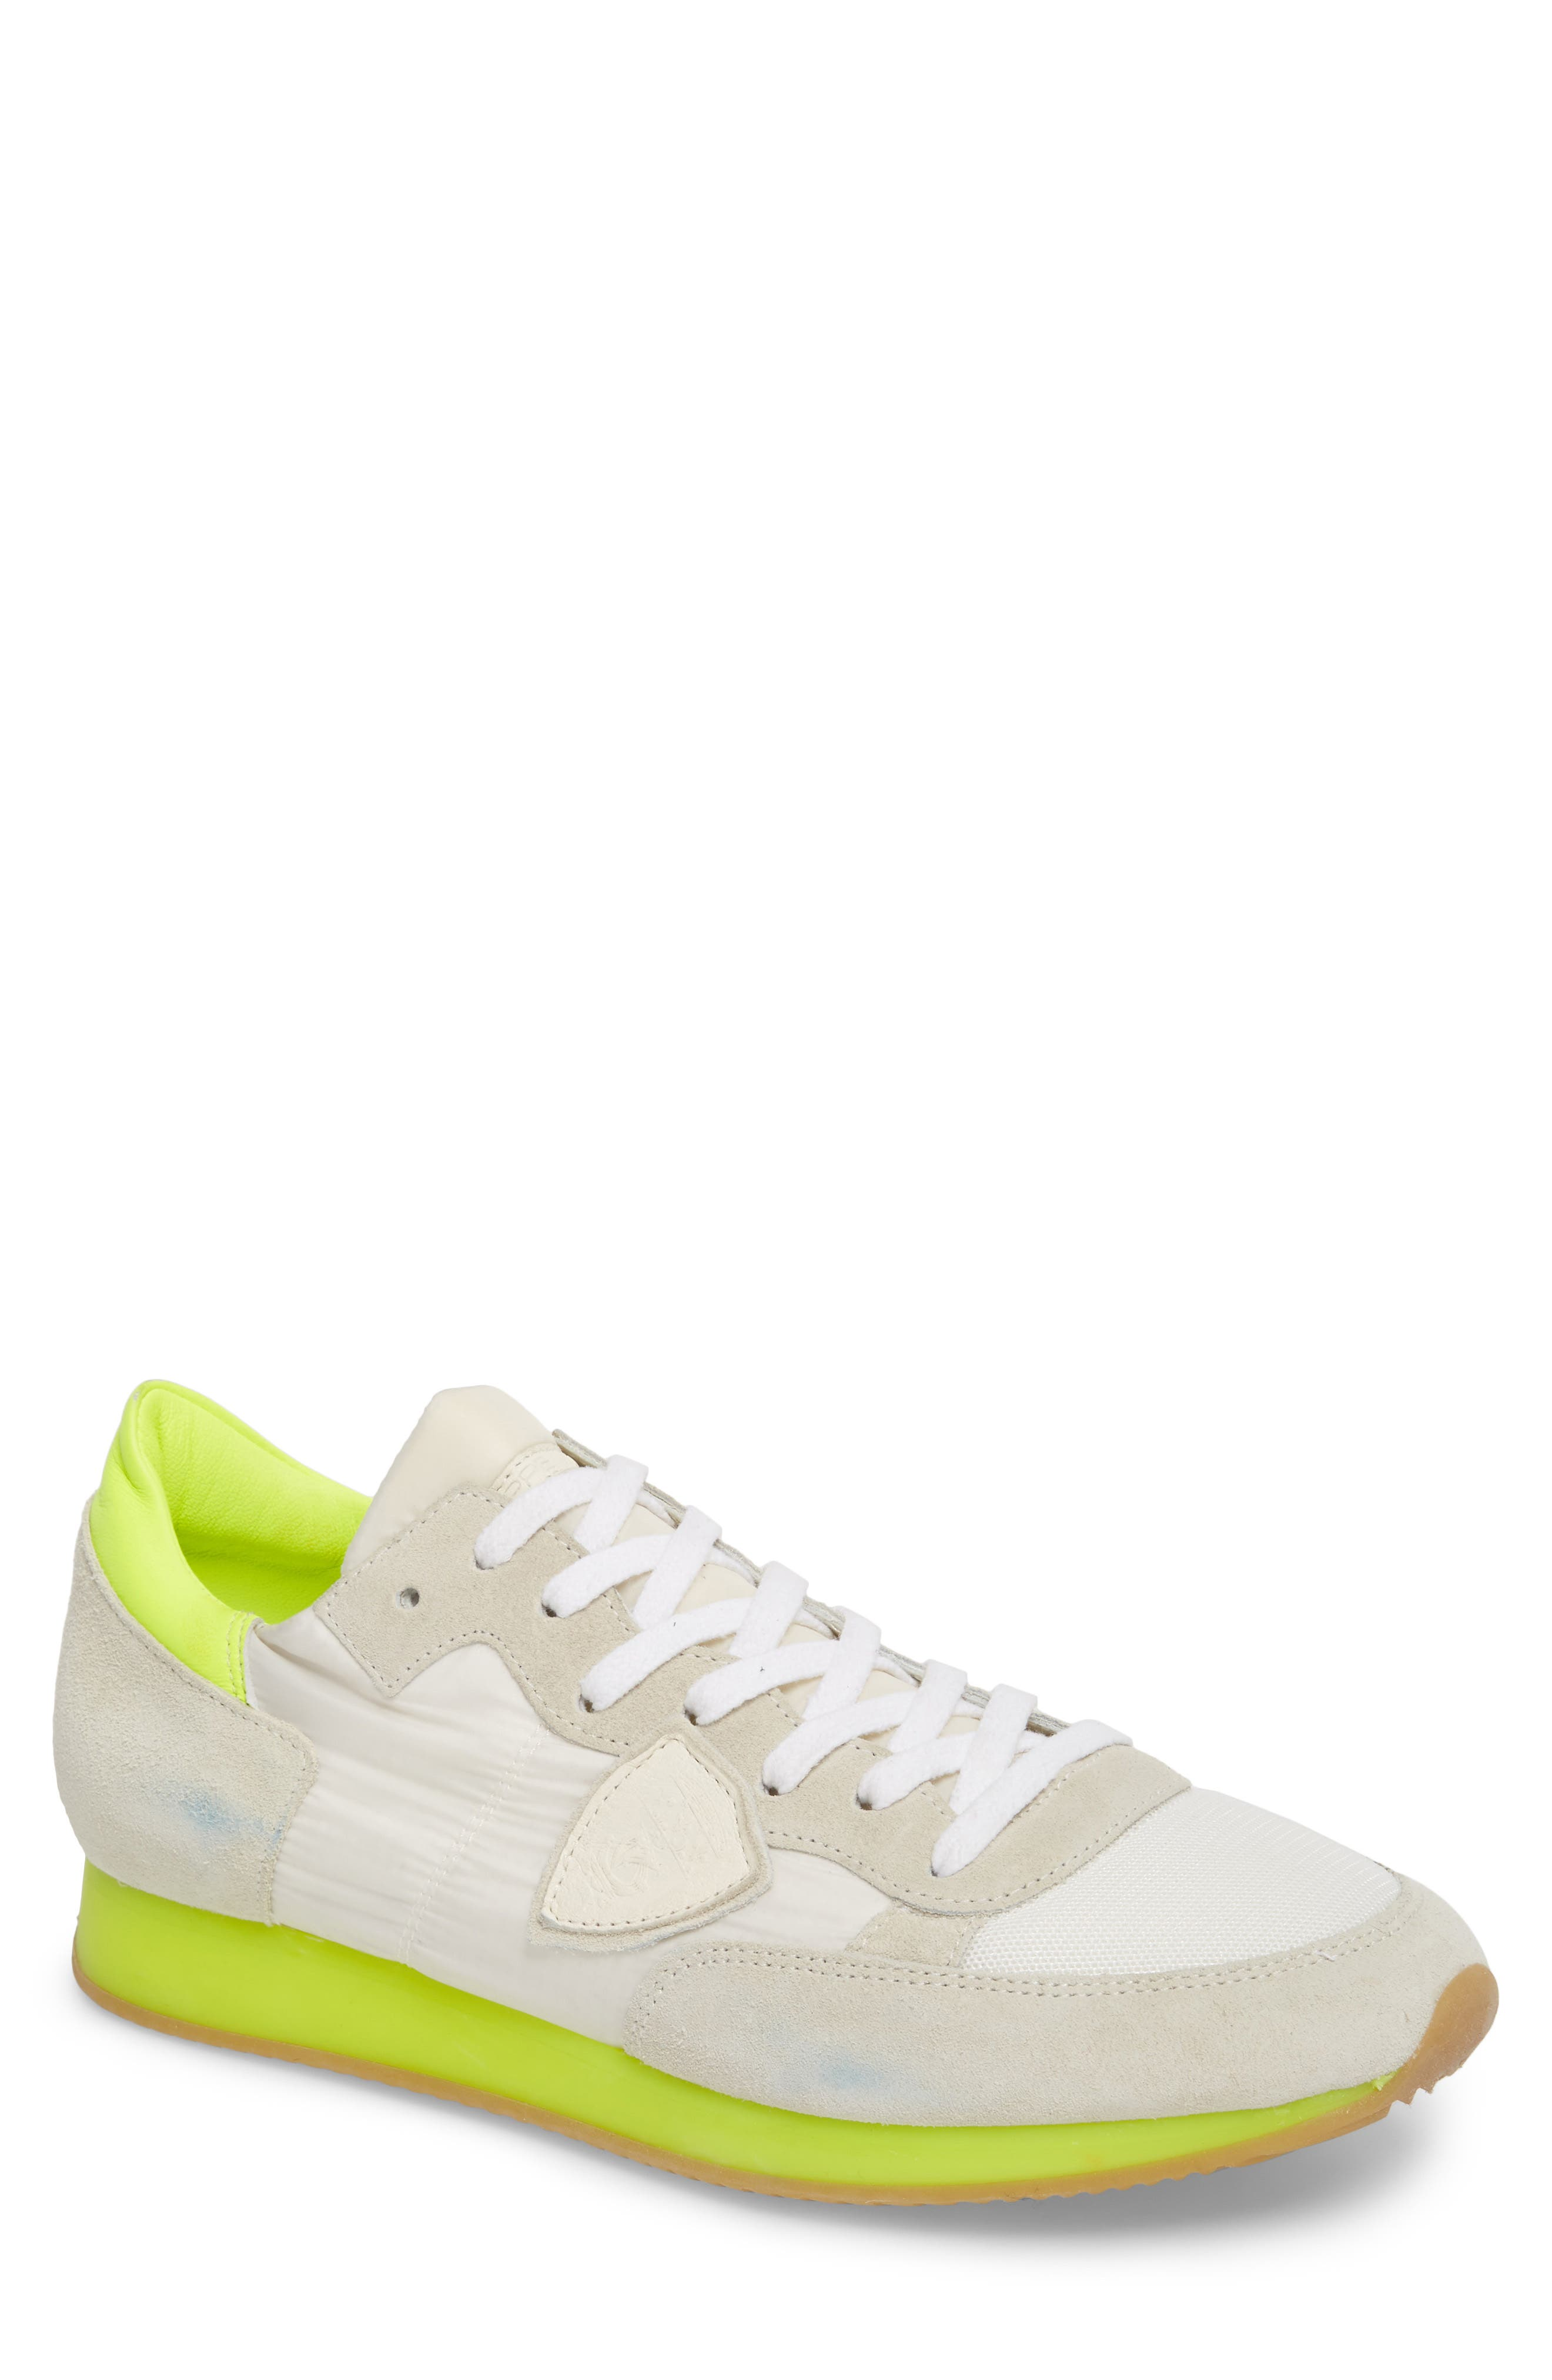 Alternate Image 1 Selected - Philippe Model Tropez Low Top Sneaker (Men)